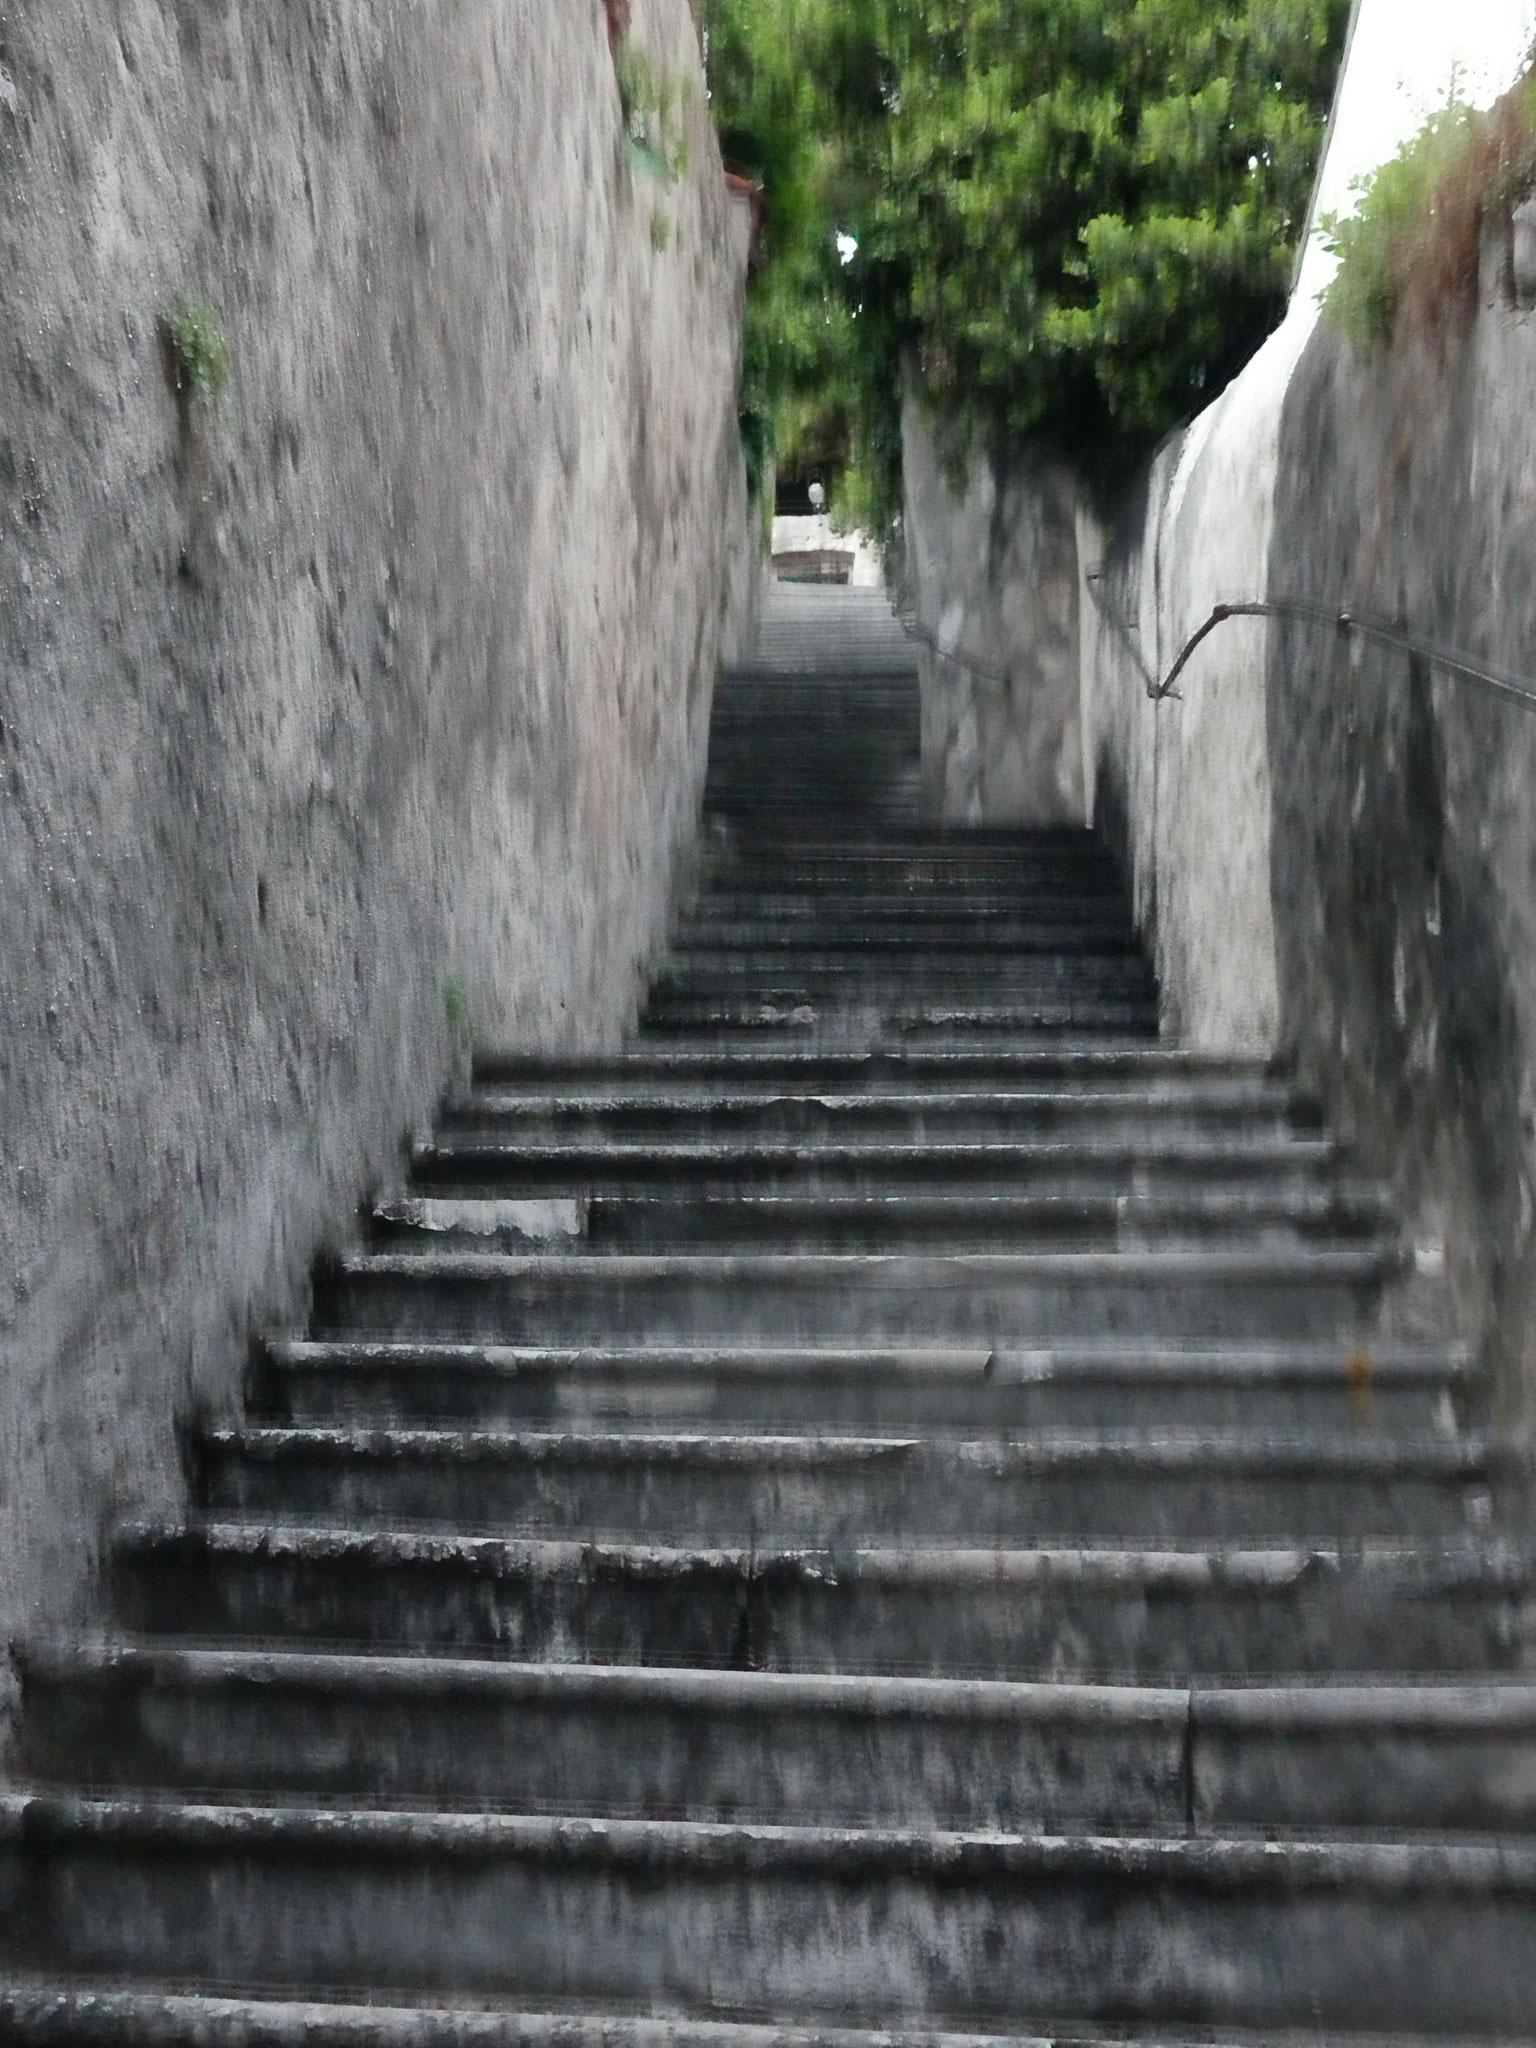 Stufen, Stufen, Stufen ..... überall Stufen